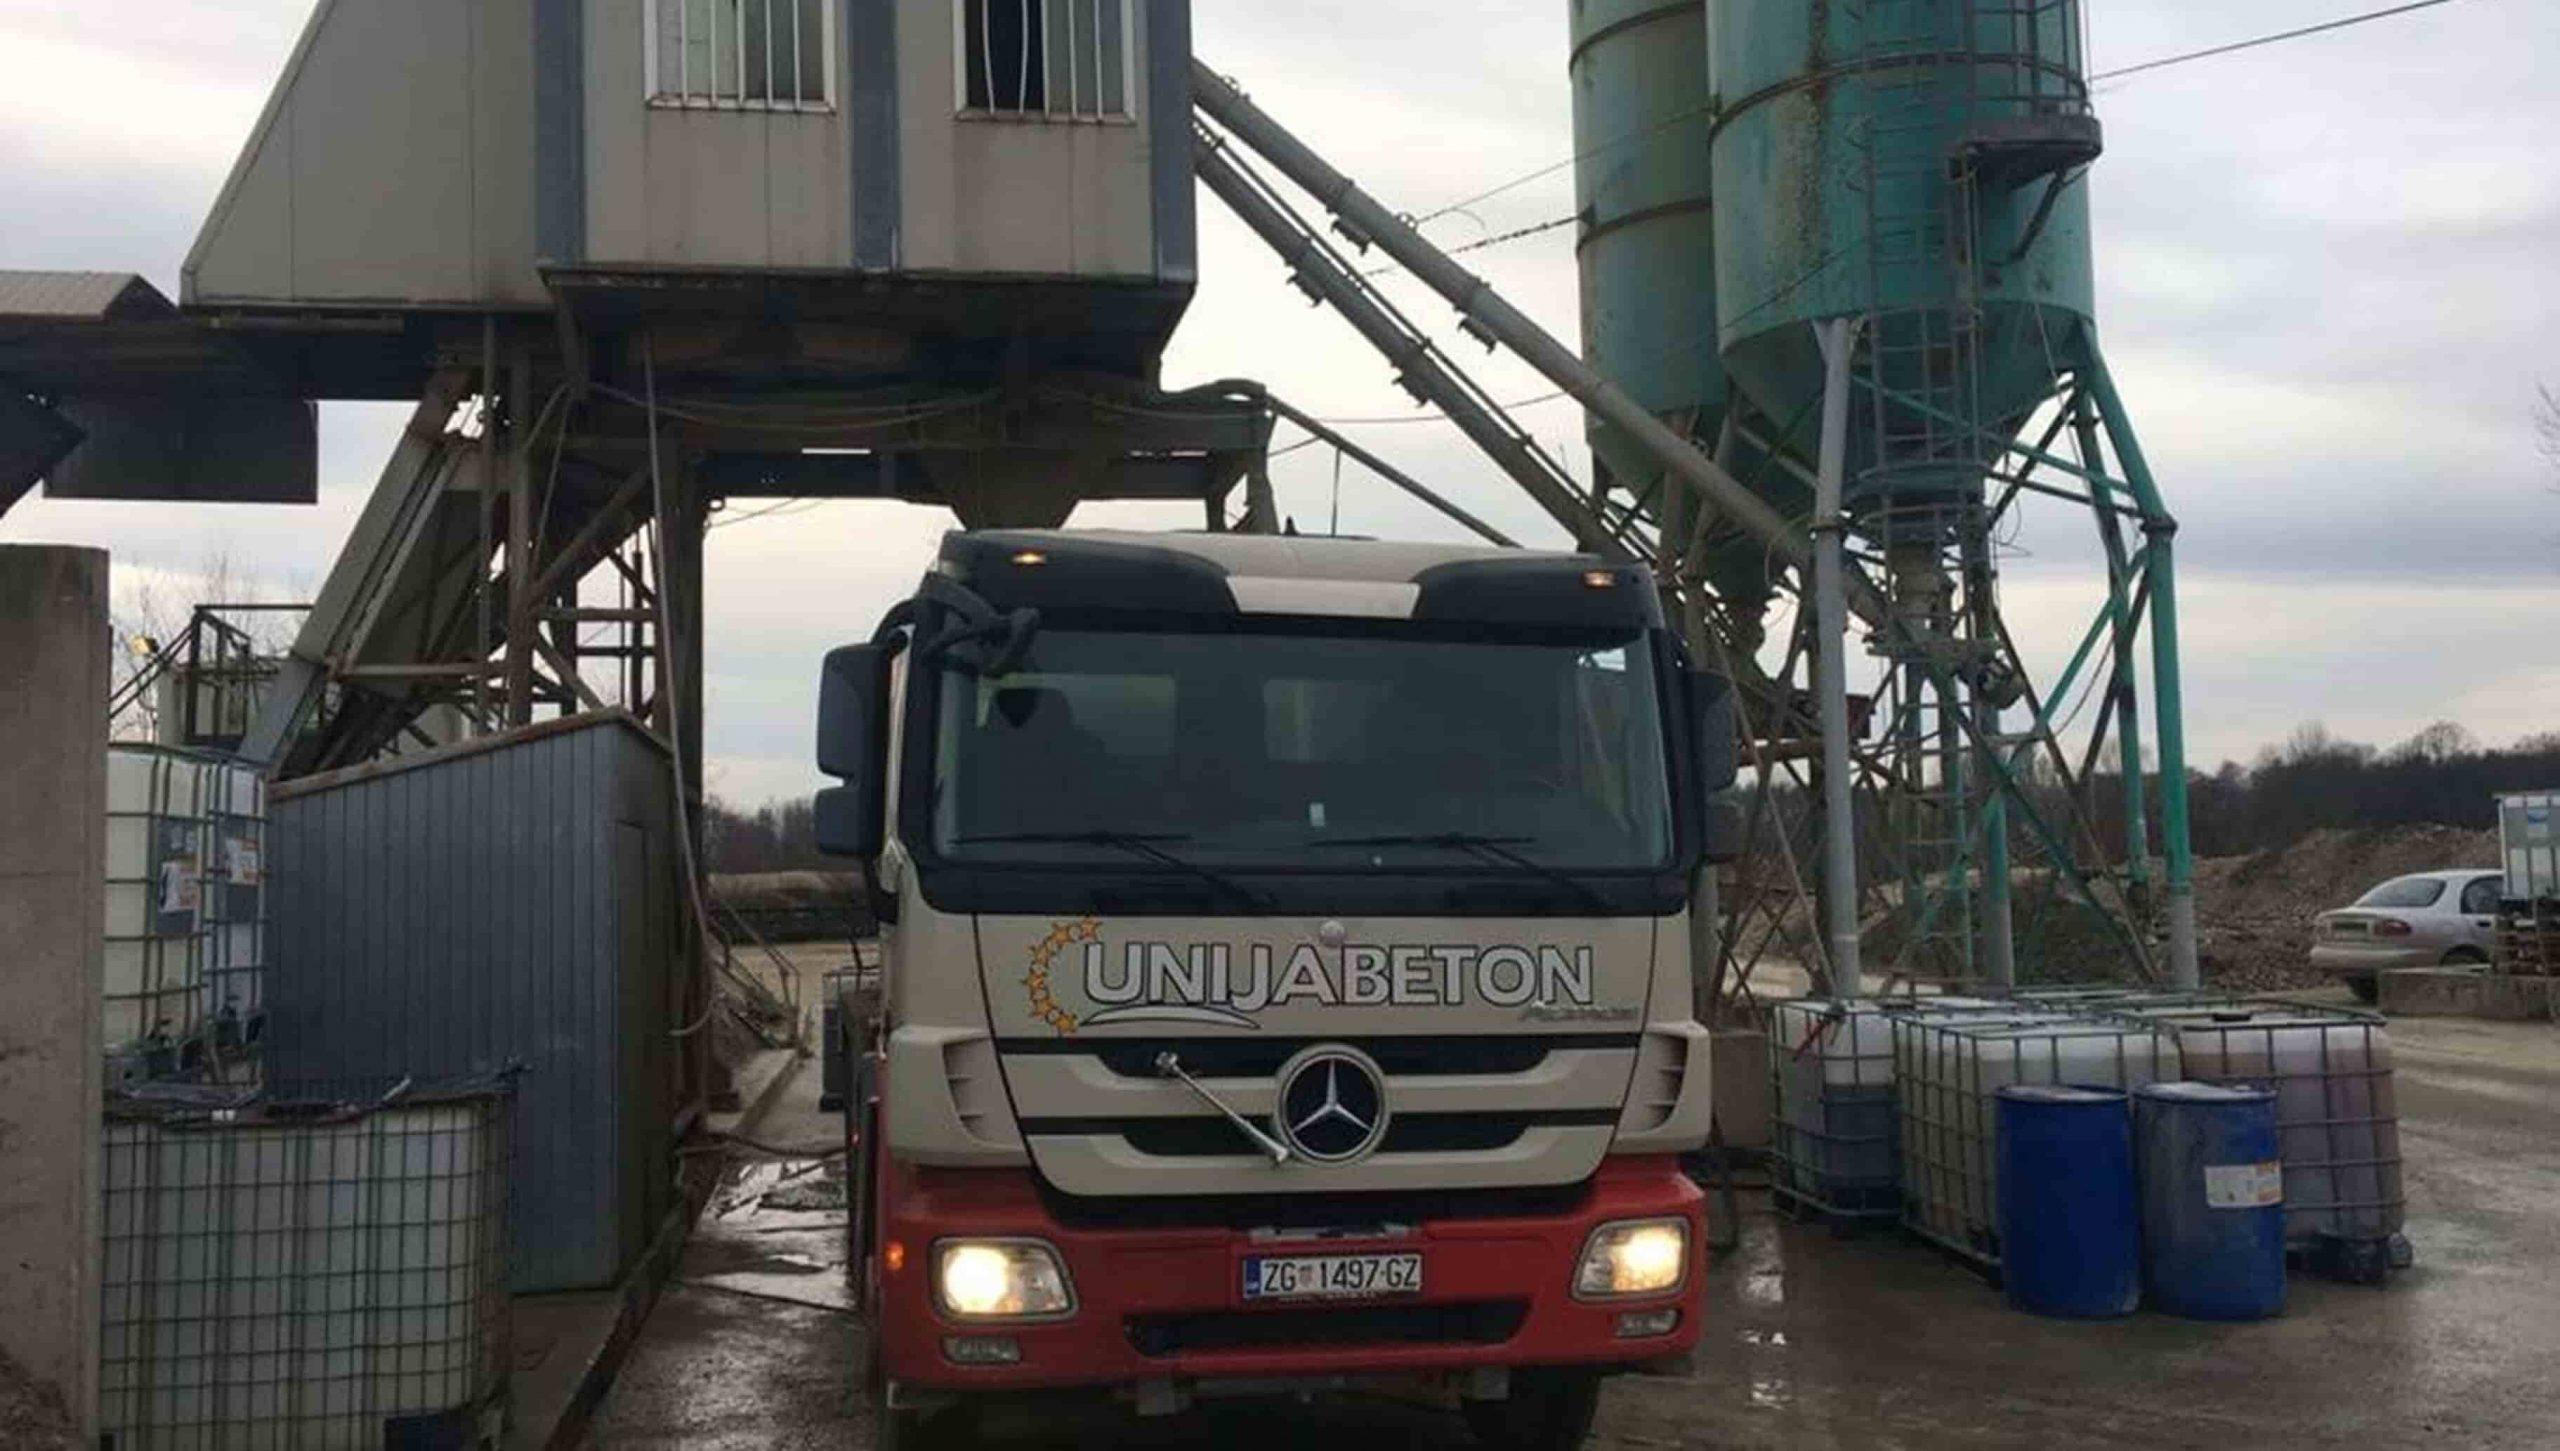 Oru plant – production capacity 55 m3/h